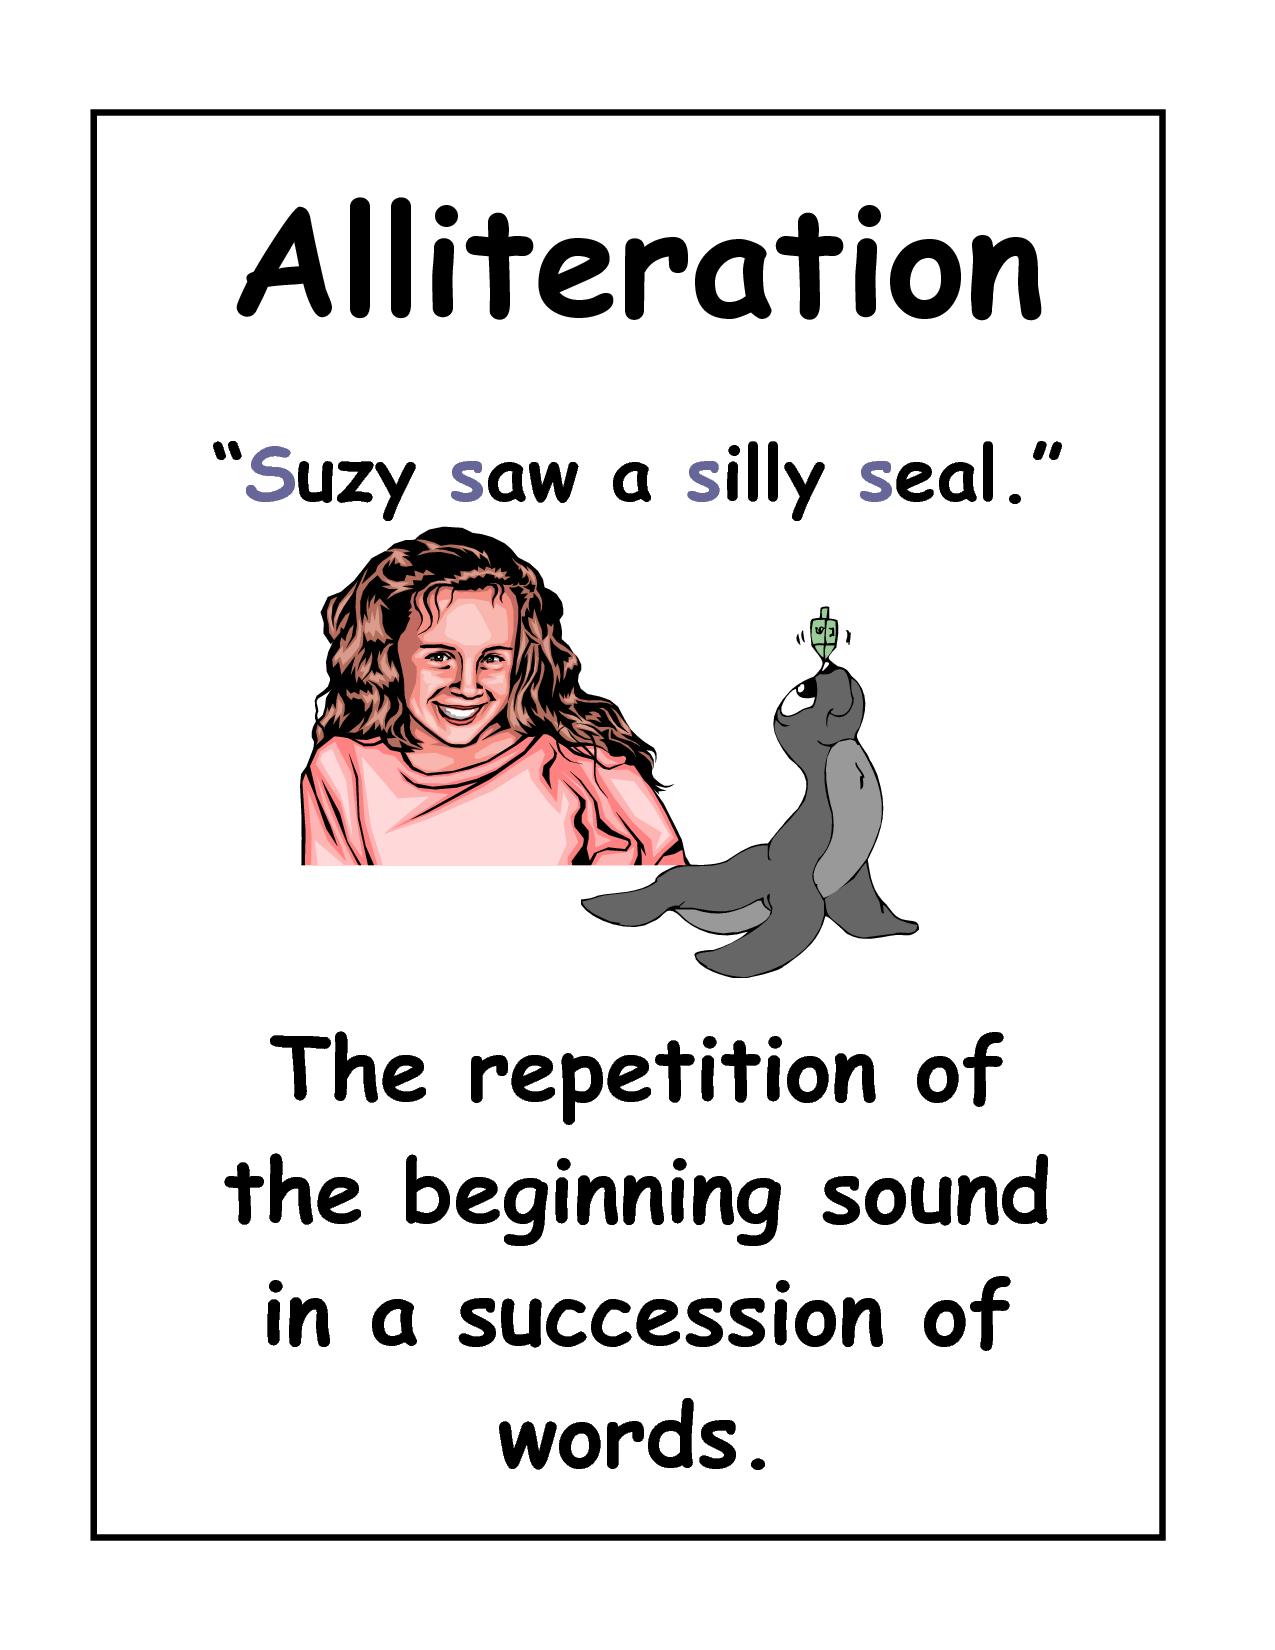 Alliteration example poster   FIGURATIVE LANGUAGE   Pinterest ...